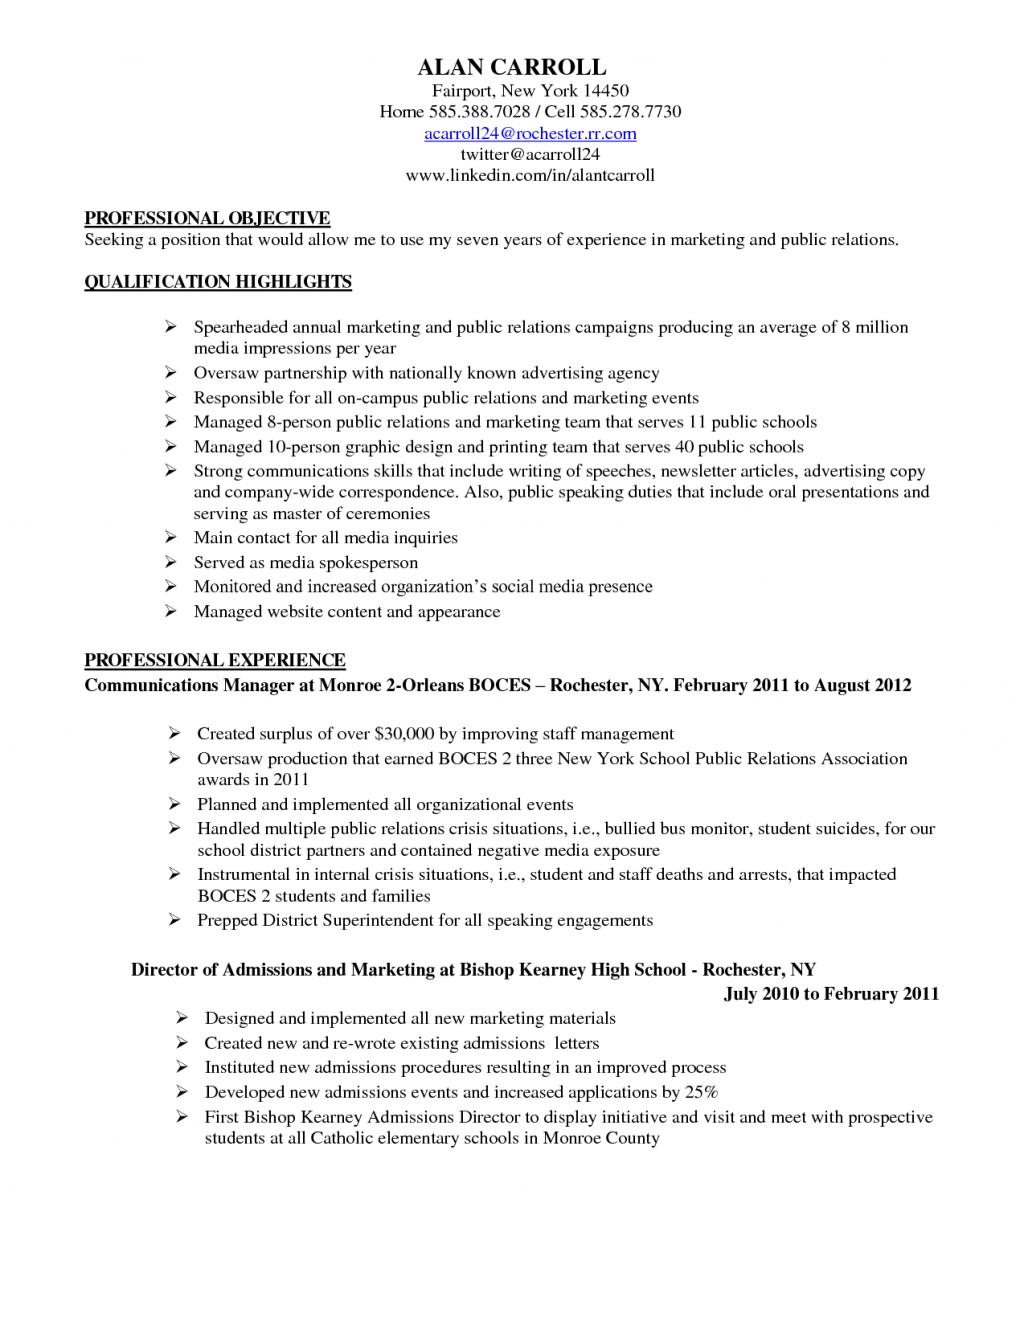 Telecommunication Specialist Resume Https Cstu Io 13b0dd Writing Prompts 2nd Grade Essay Examples Essay